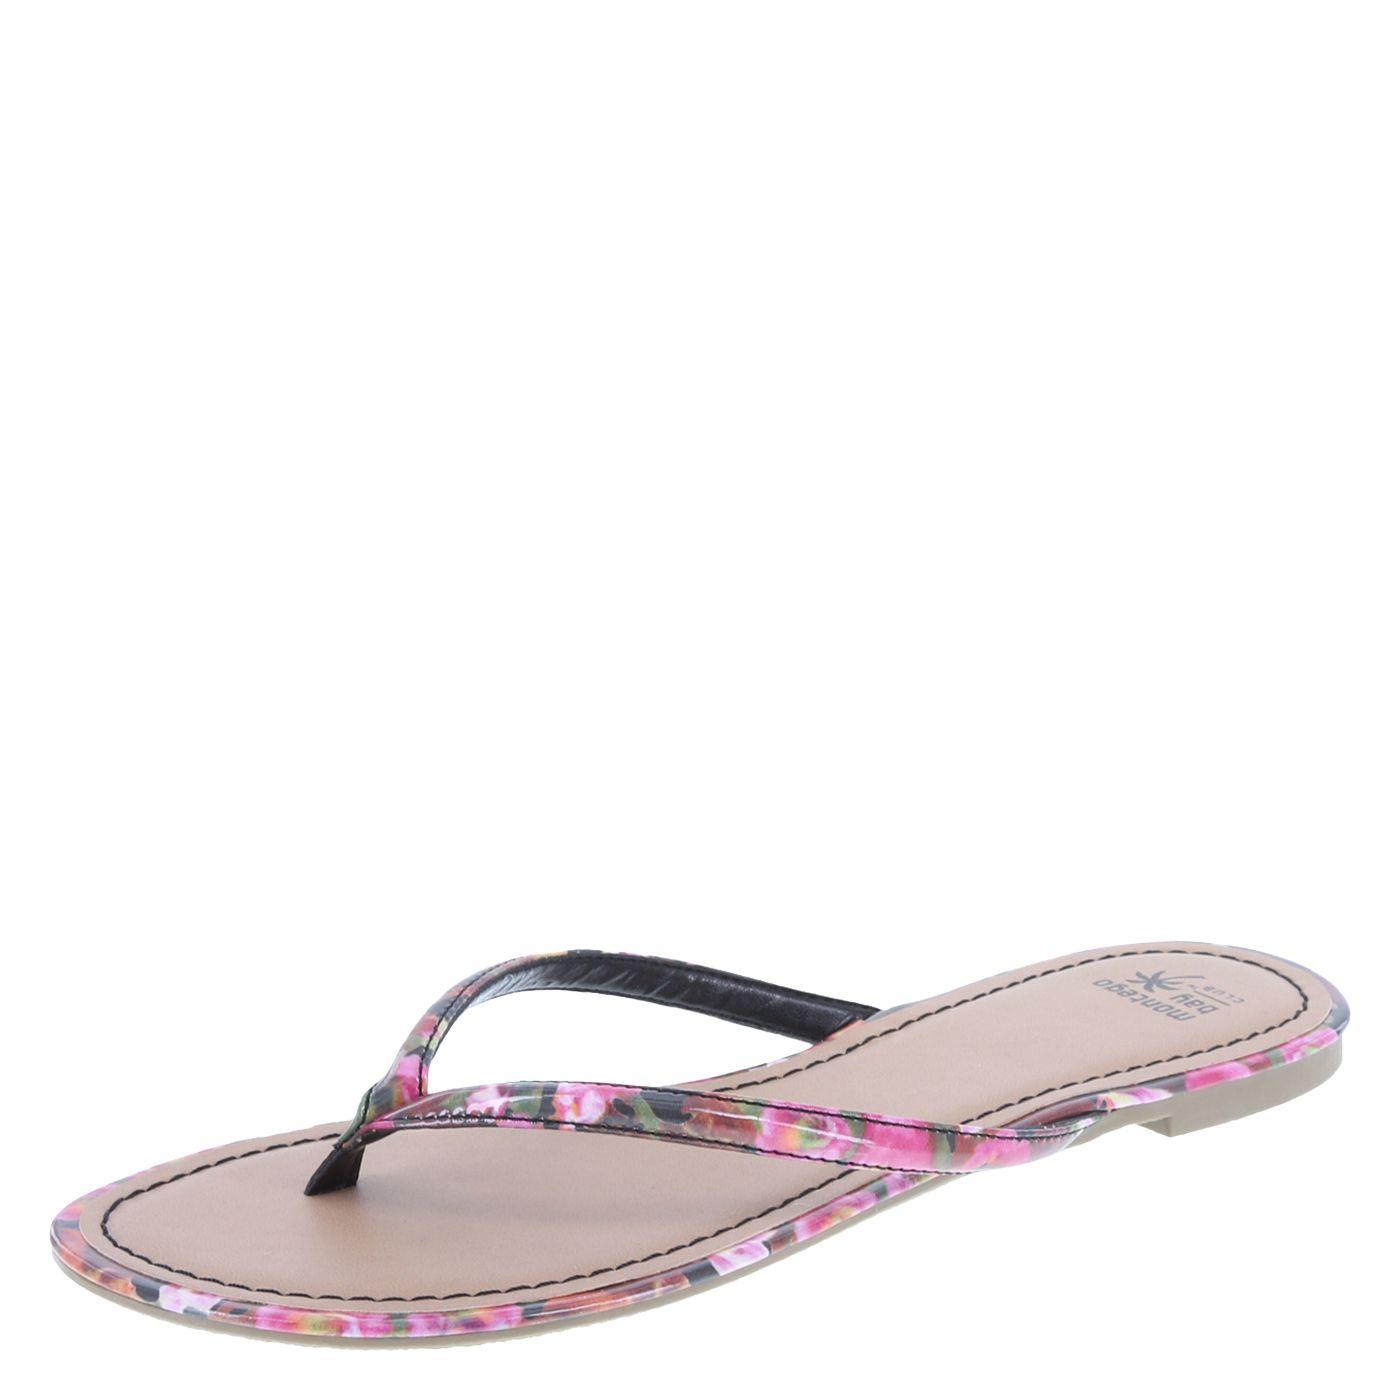 9fc1df06afd4 Women s Sandbar Flat Flip Flop